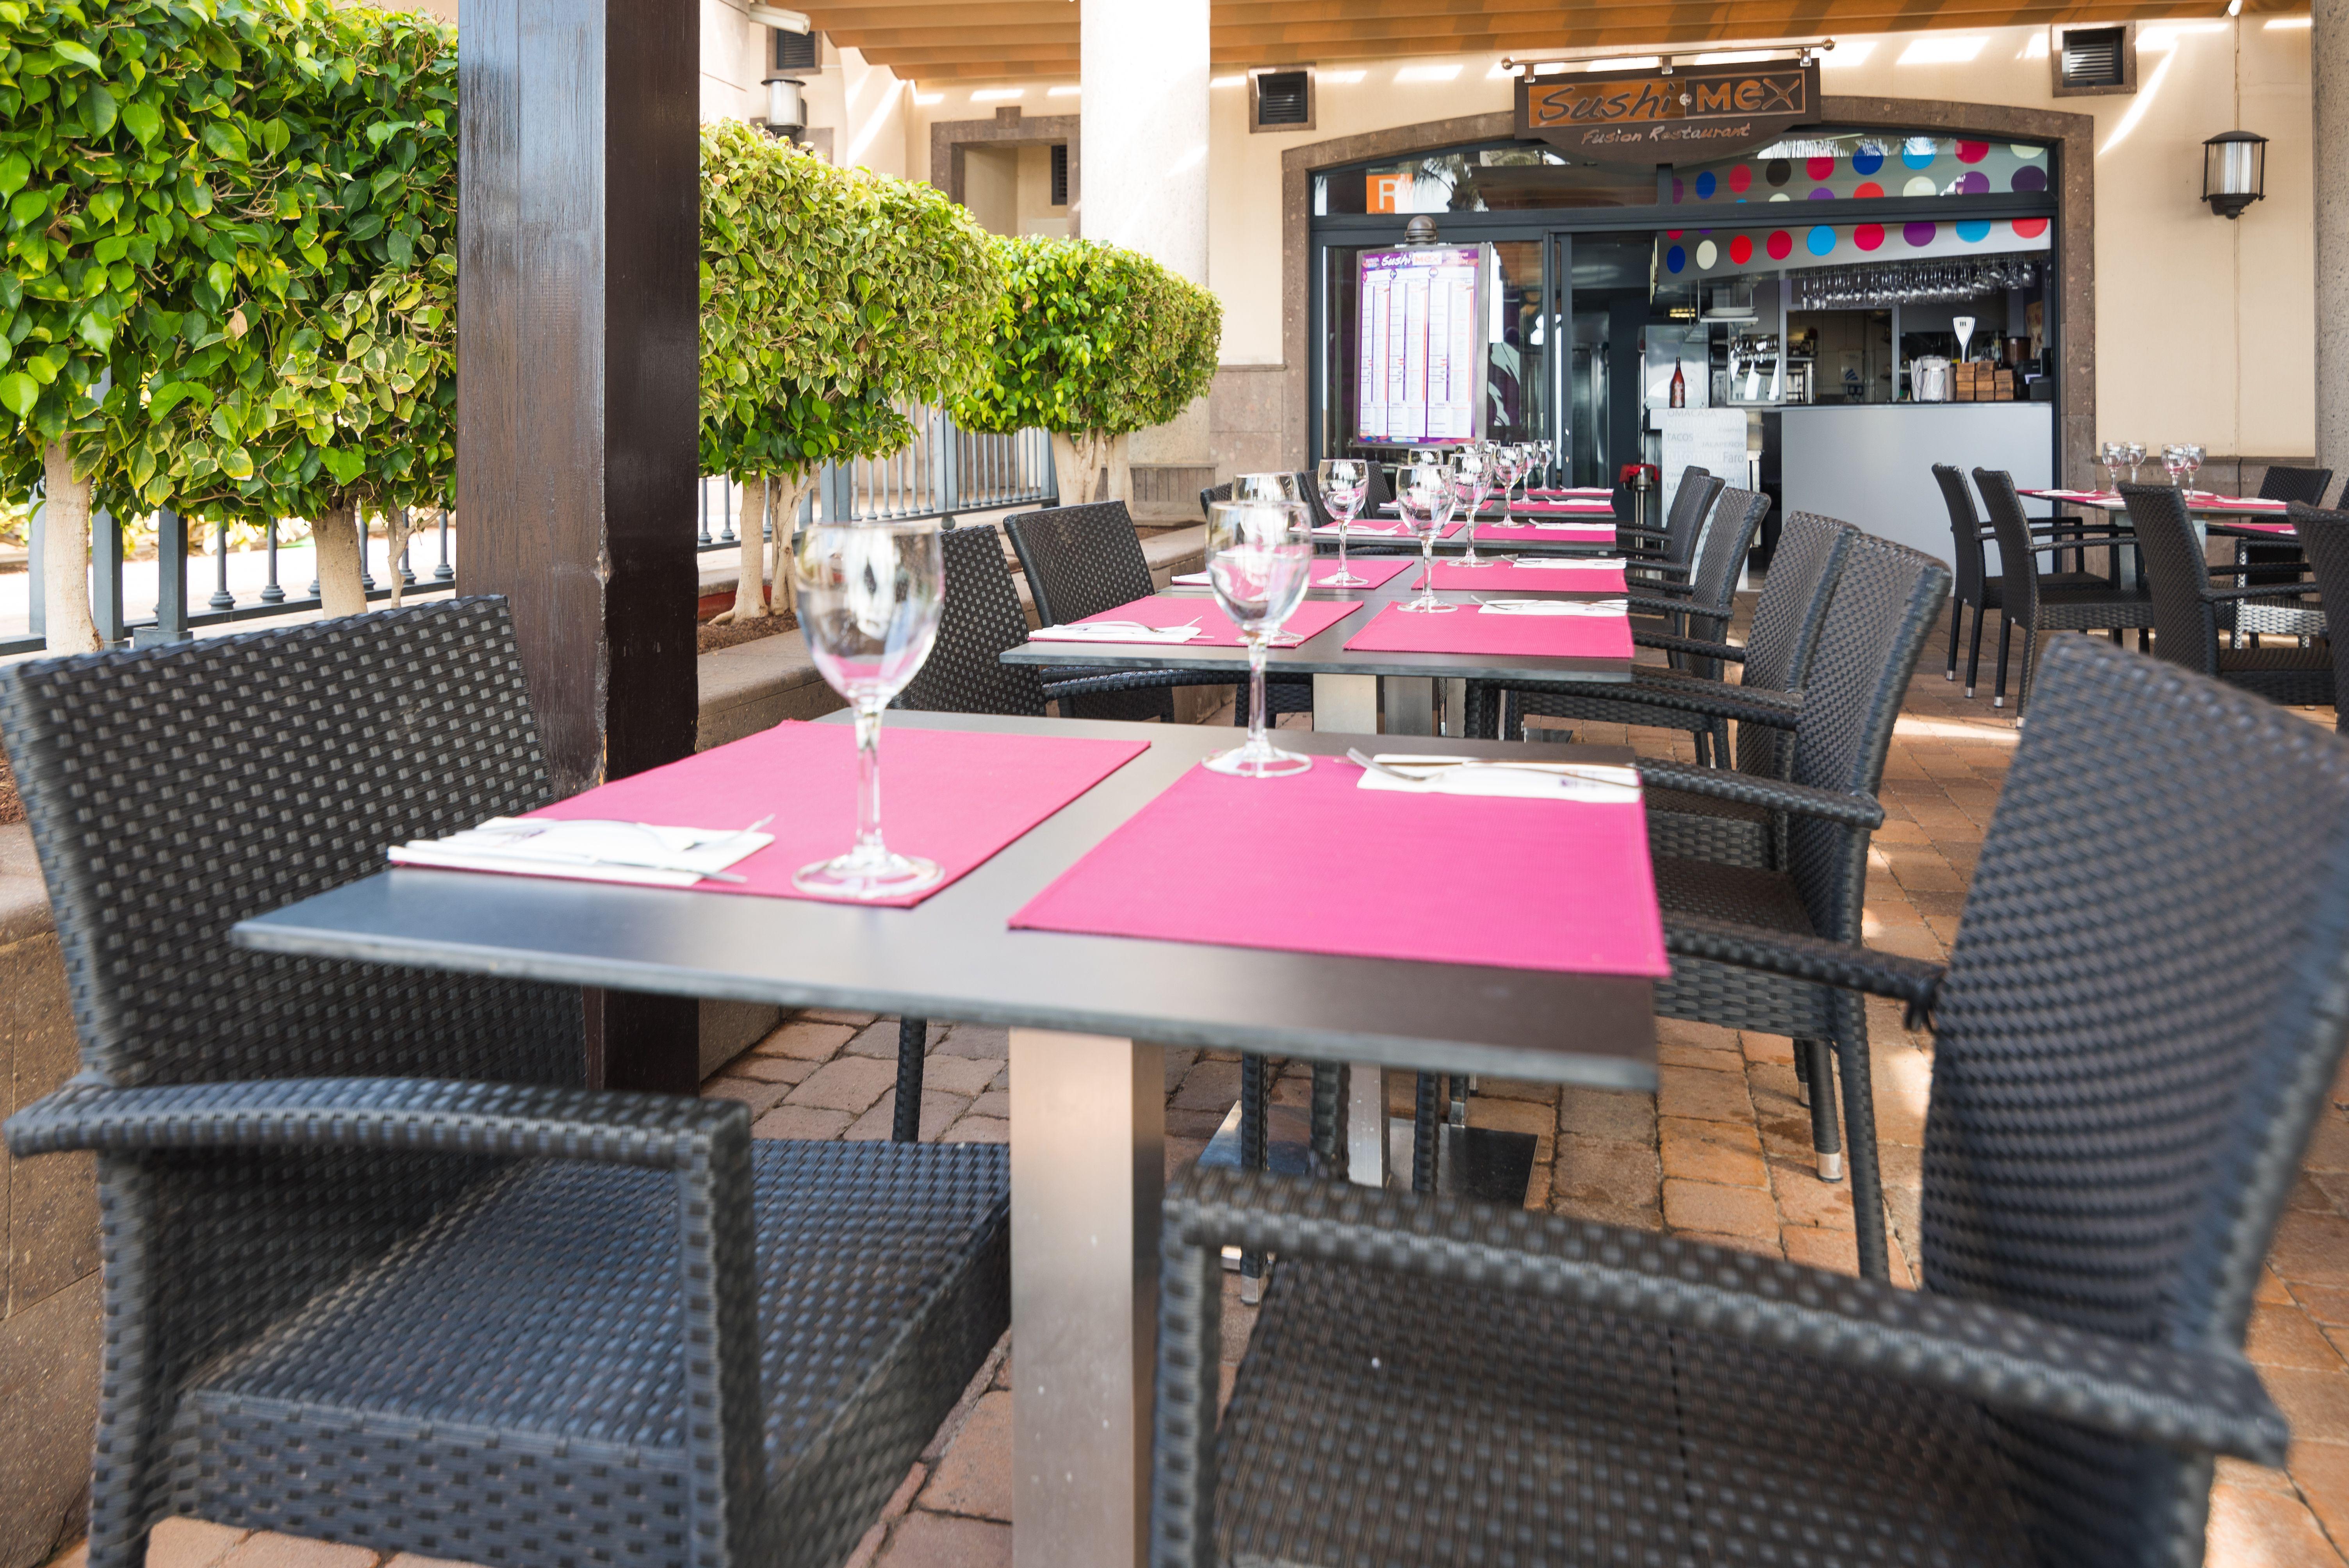 Foto 11 de Restaurante de comida fusión en San Bartolomé de Tirajana | Restaurante SushiMex